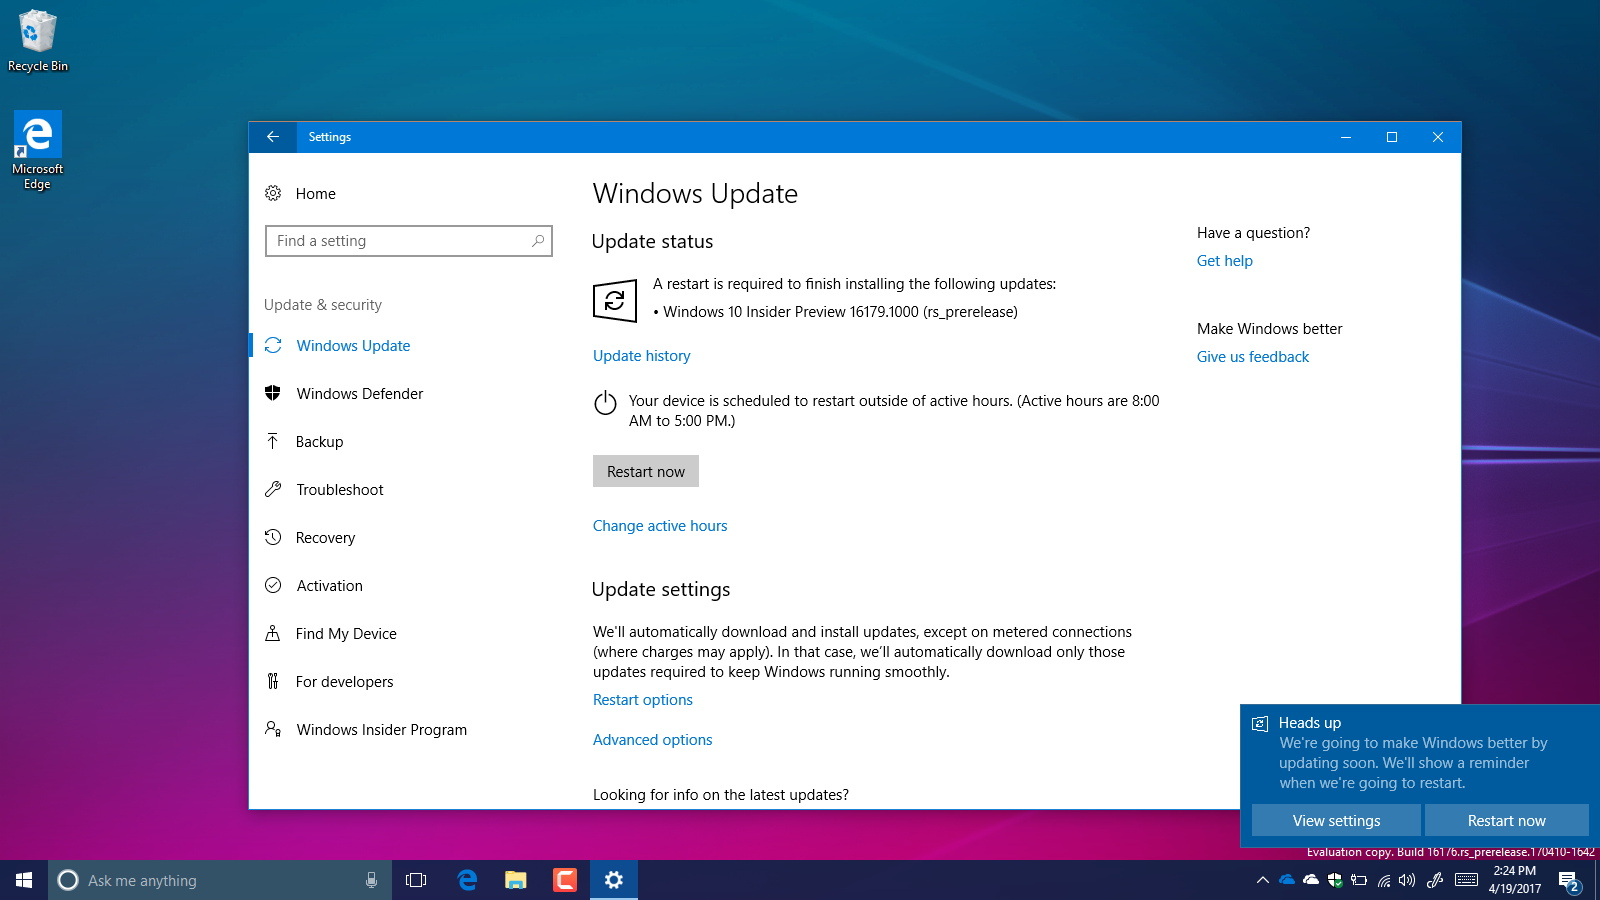 Windows 10 build 16179